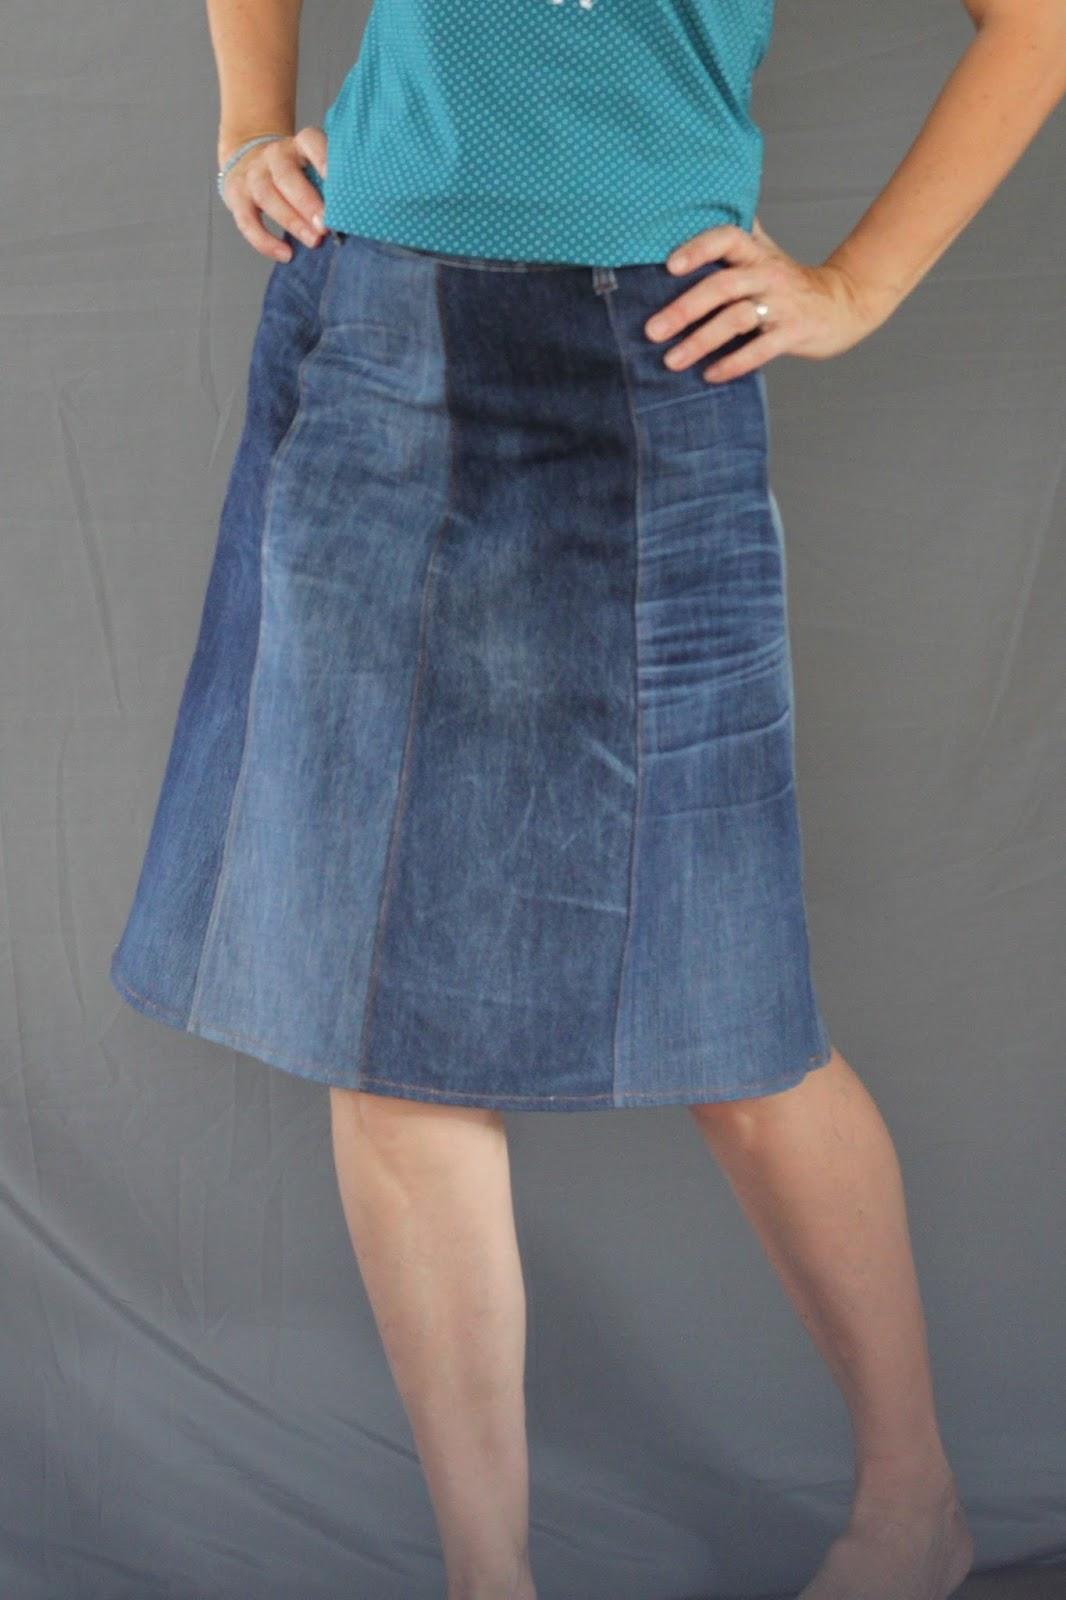 Fadegrad Juperock Aus Gebrauchten Jeans Jeansrecycling